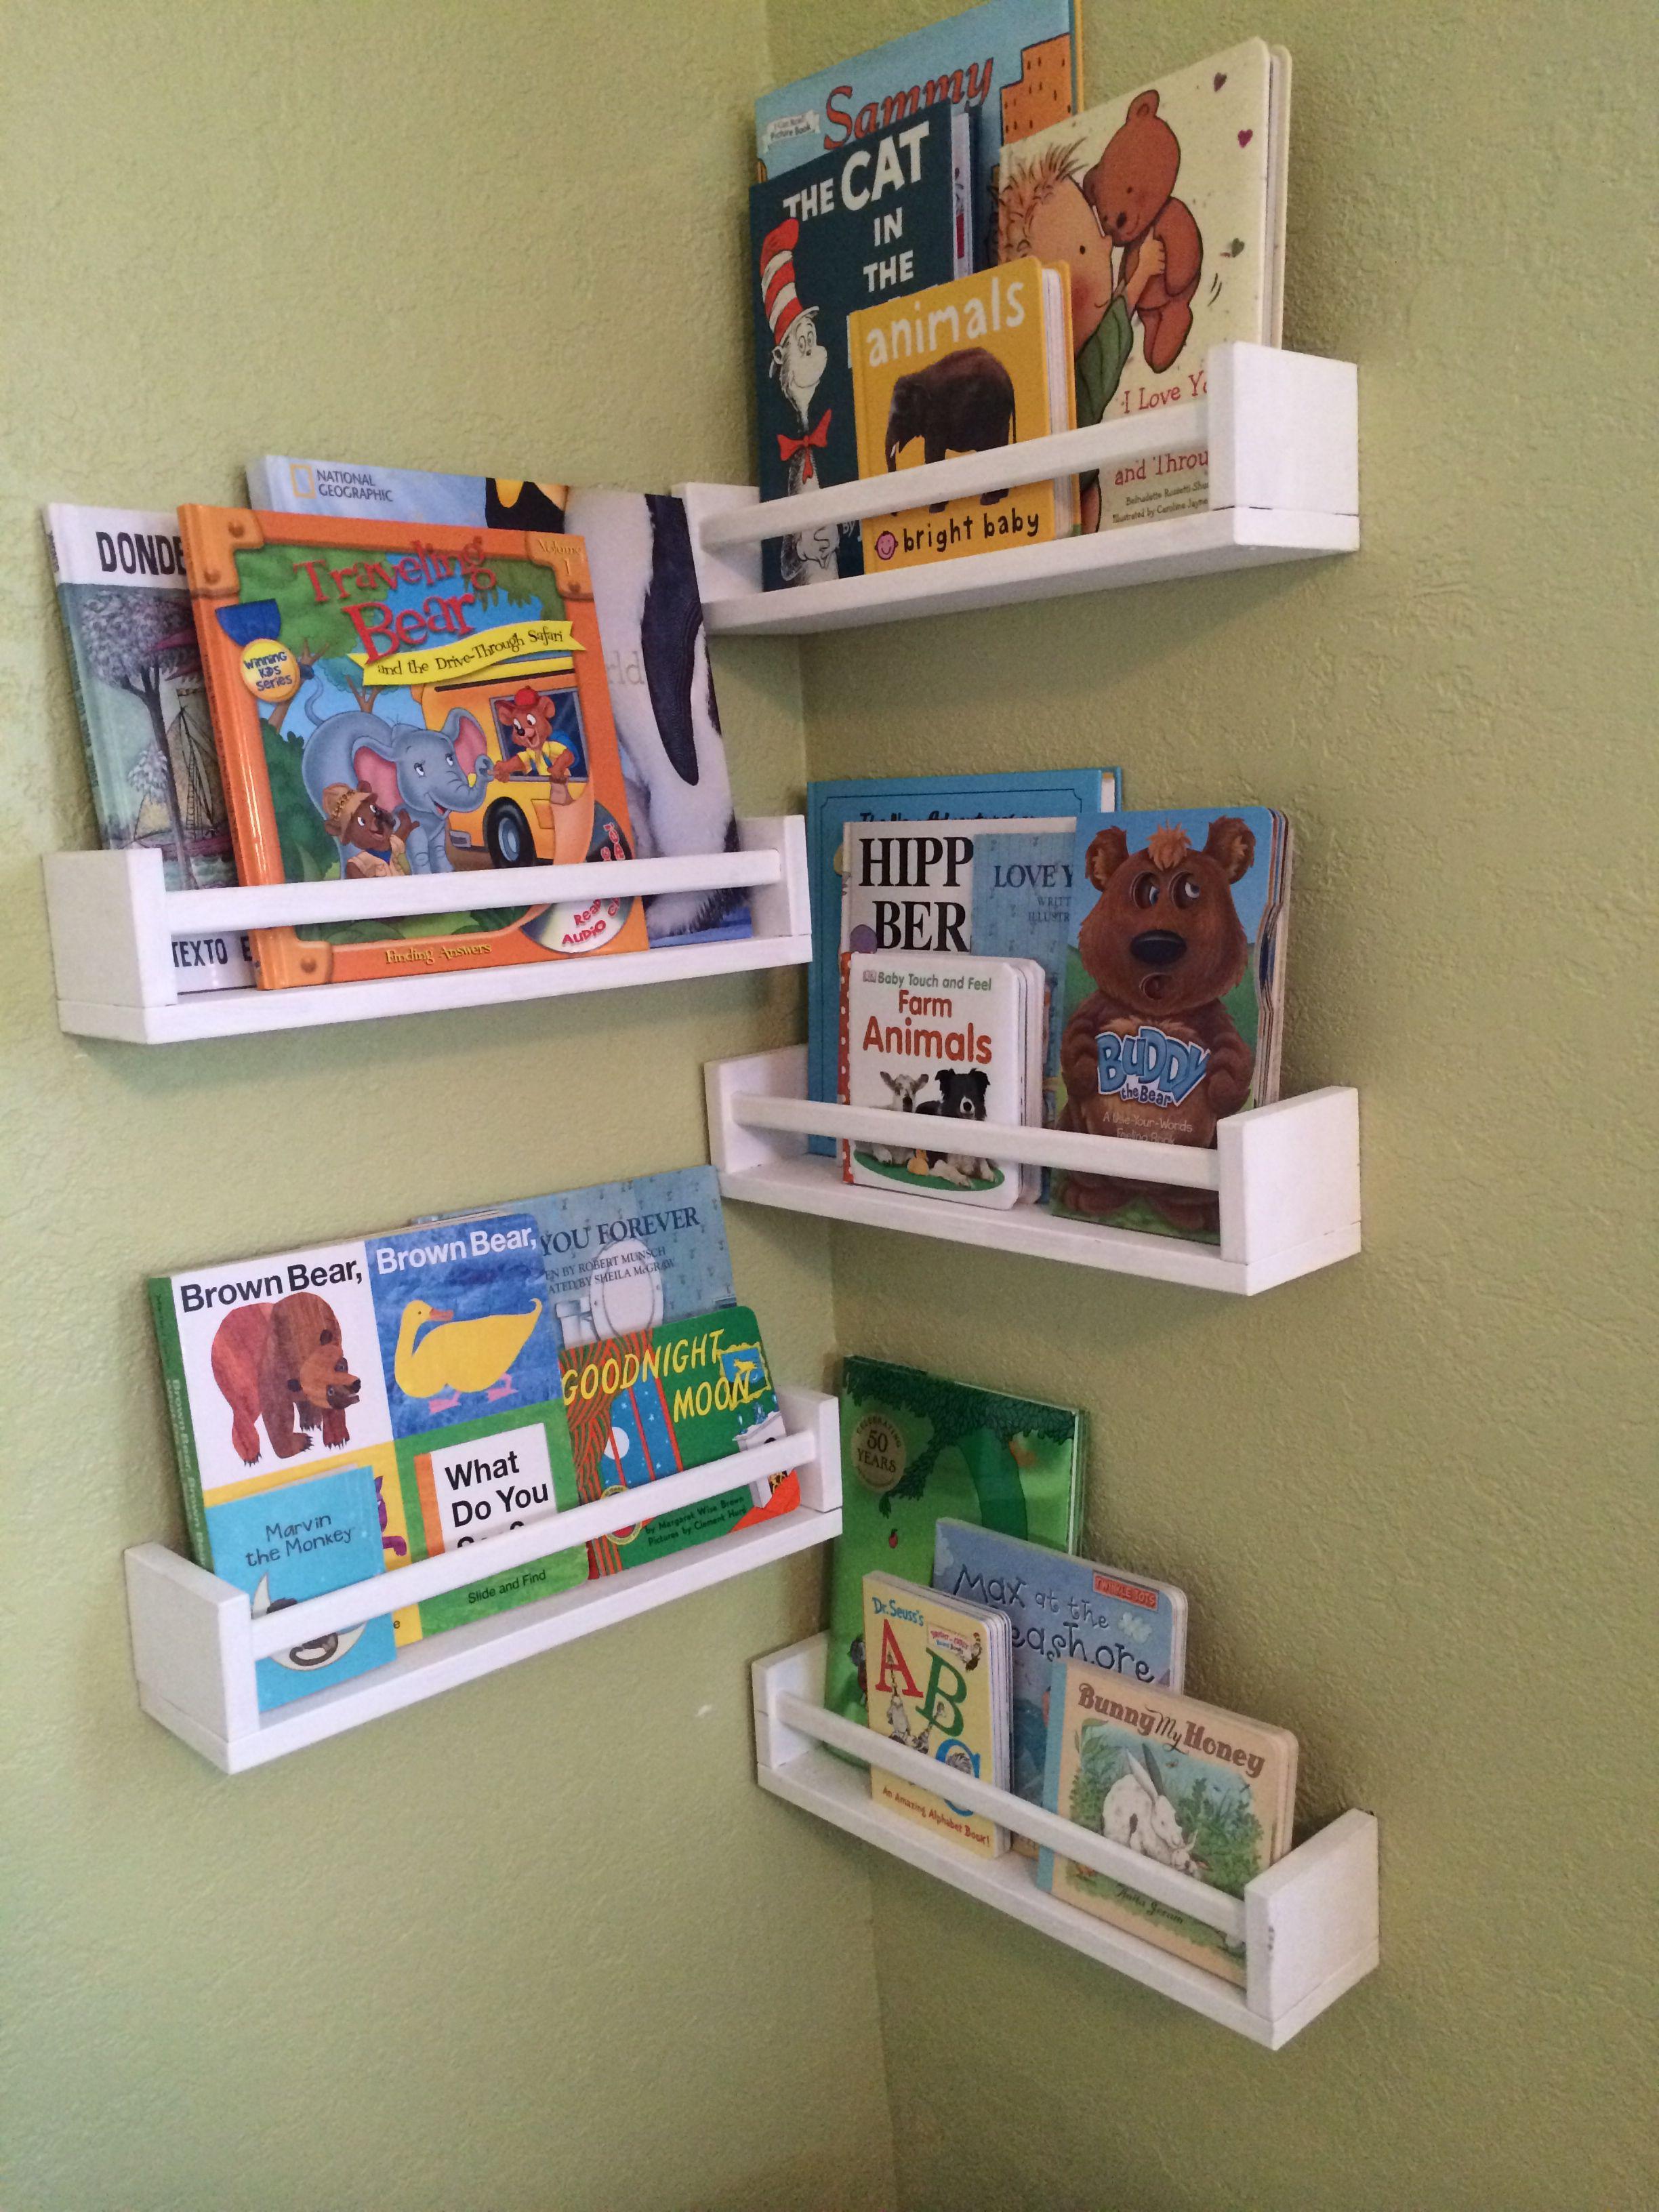 Remarkable Ikea Spice Racks As Bookshelves In Nursery Diy Nursery Download Free Architecture Designs Scobabritishbridgeorg